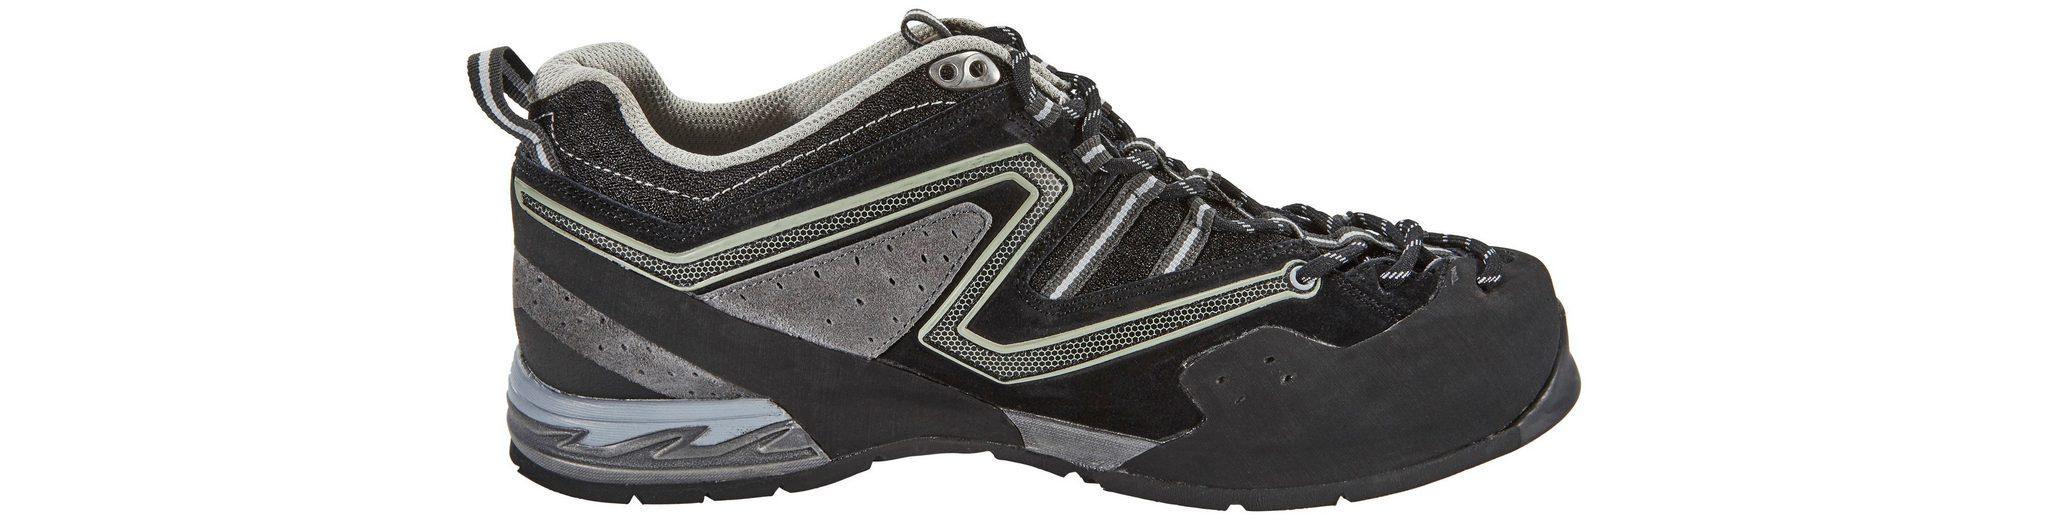 Konstrukteur Millet Kletterschuh Rockrise Shoes Men Billig Empfehlen EqWQ3ewZ